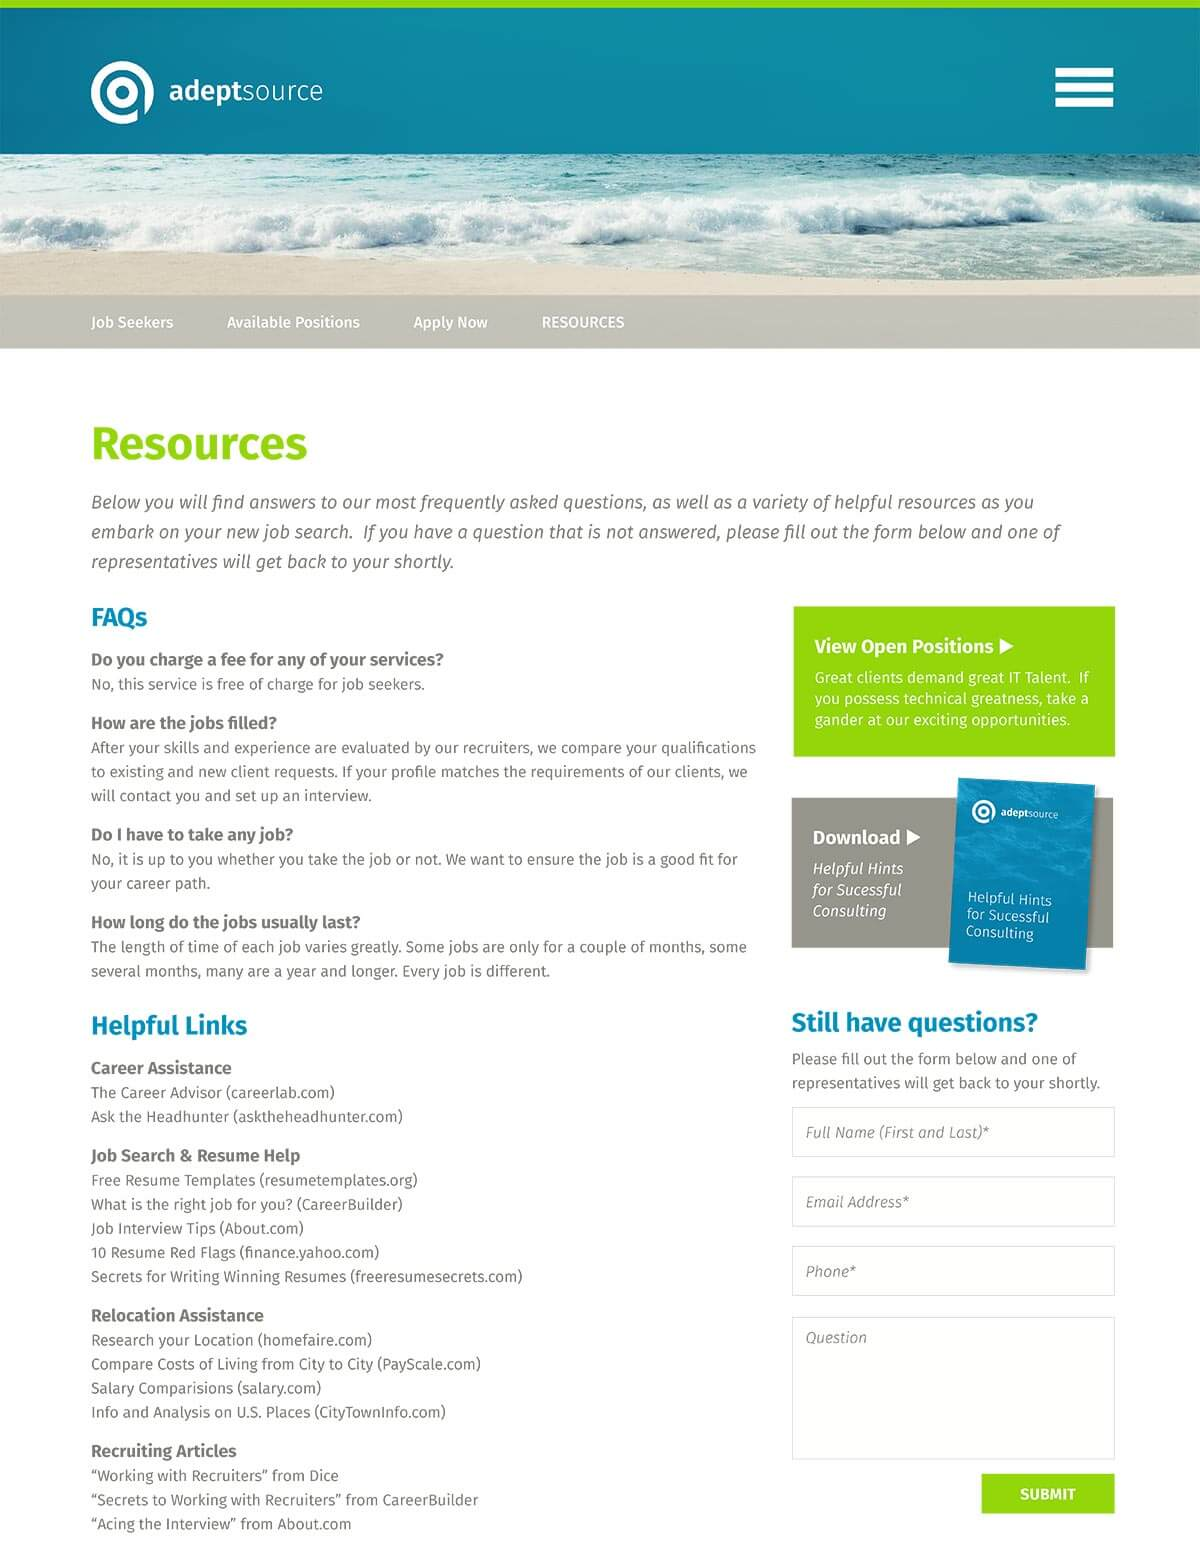 Adeptsource website resources page